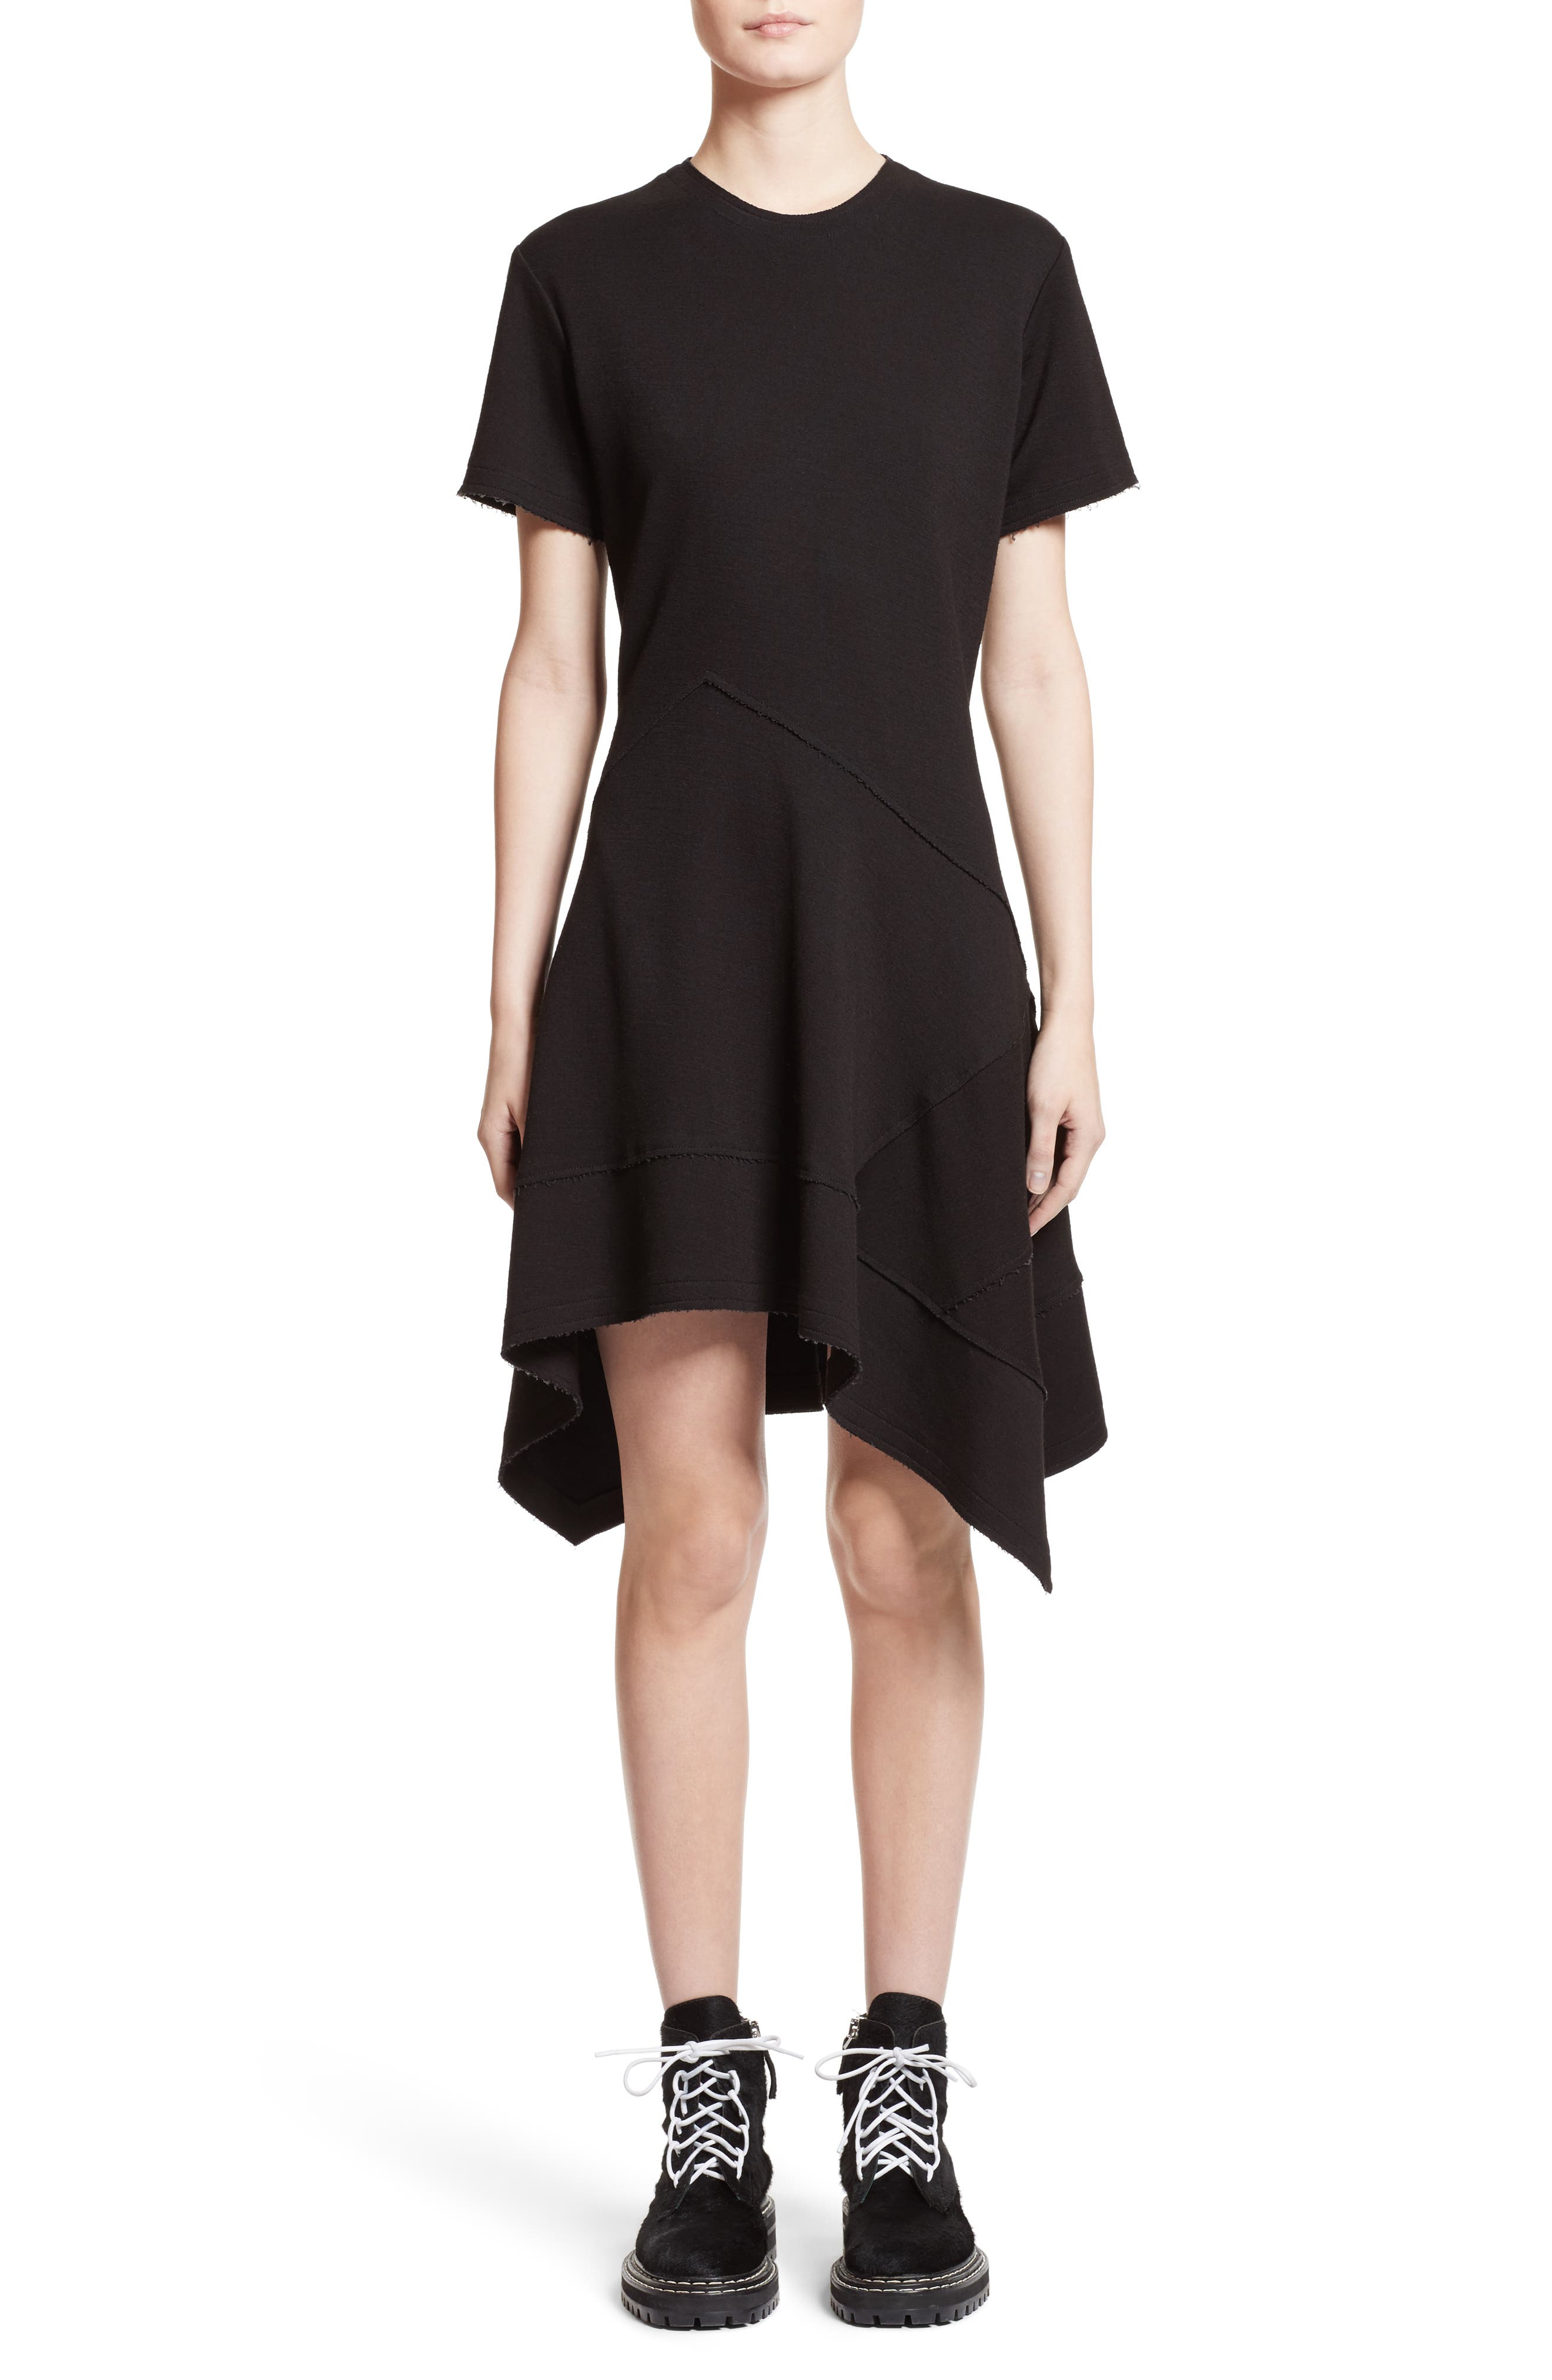 Proenza Schouler Asymmetrical Fit & Flare Dress